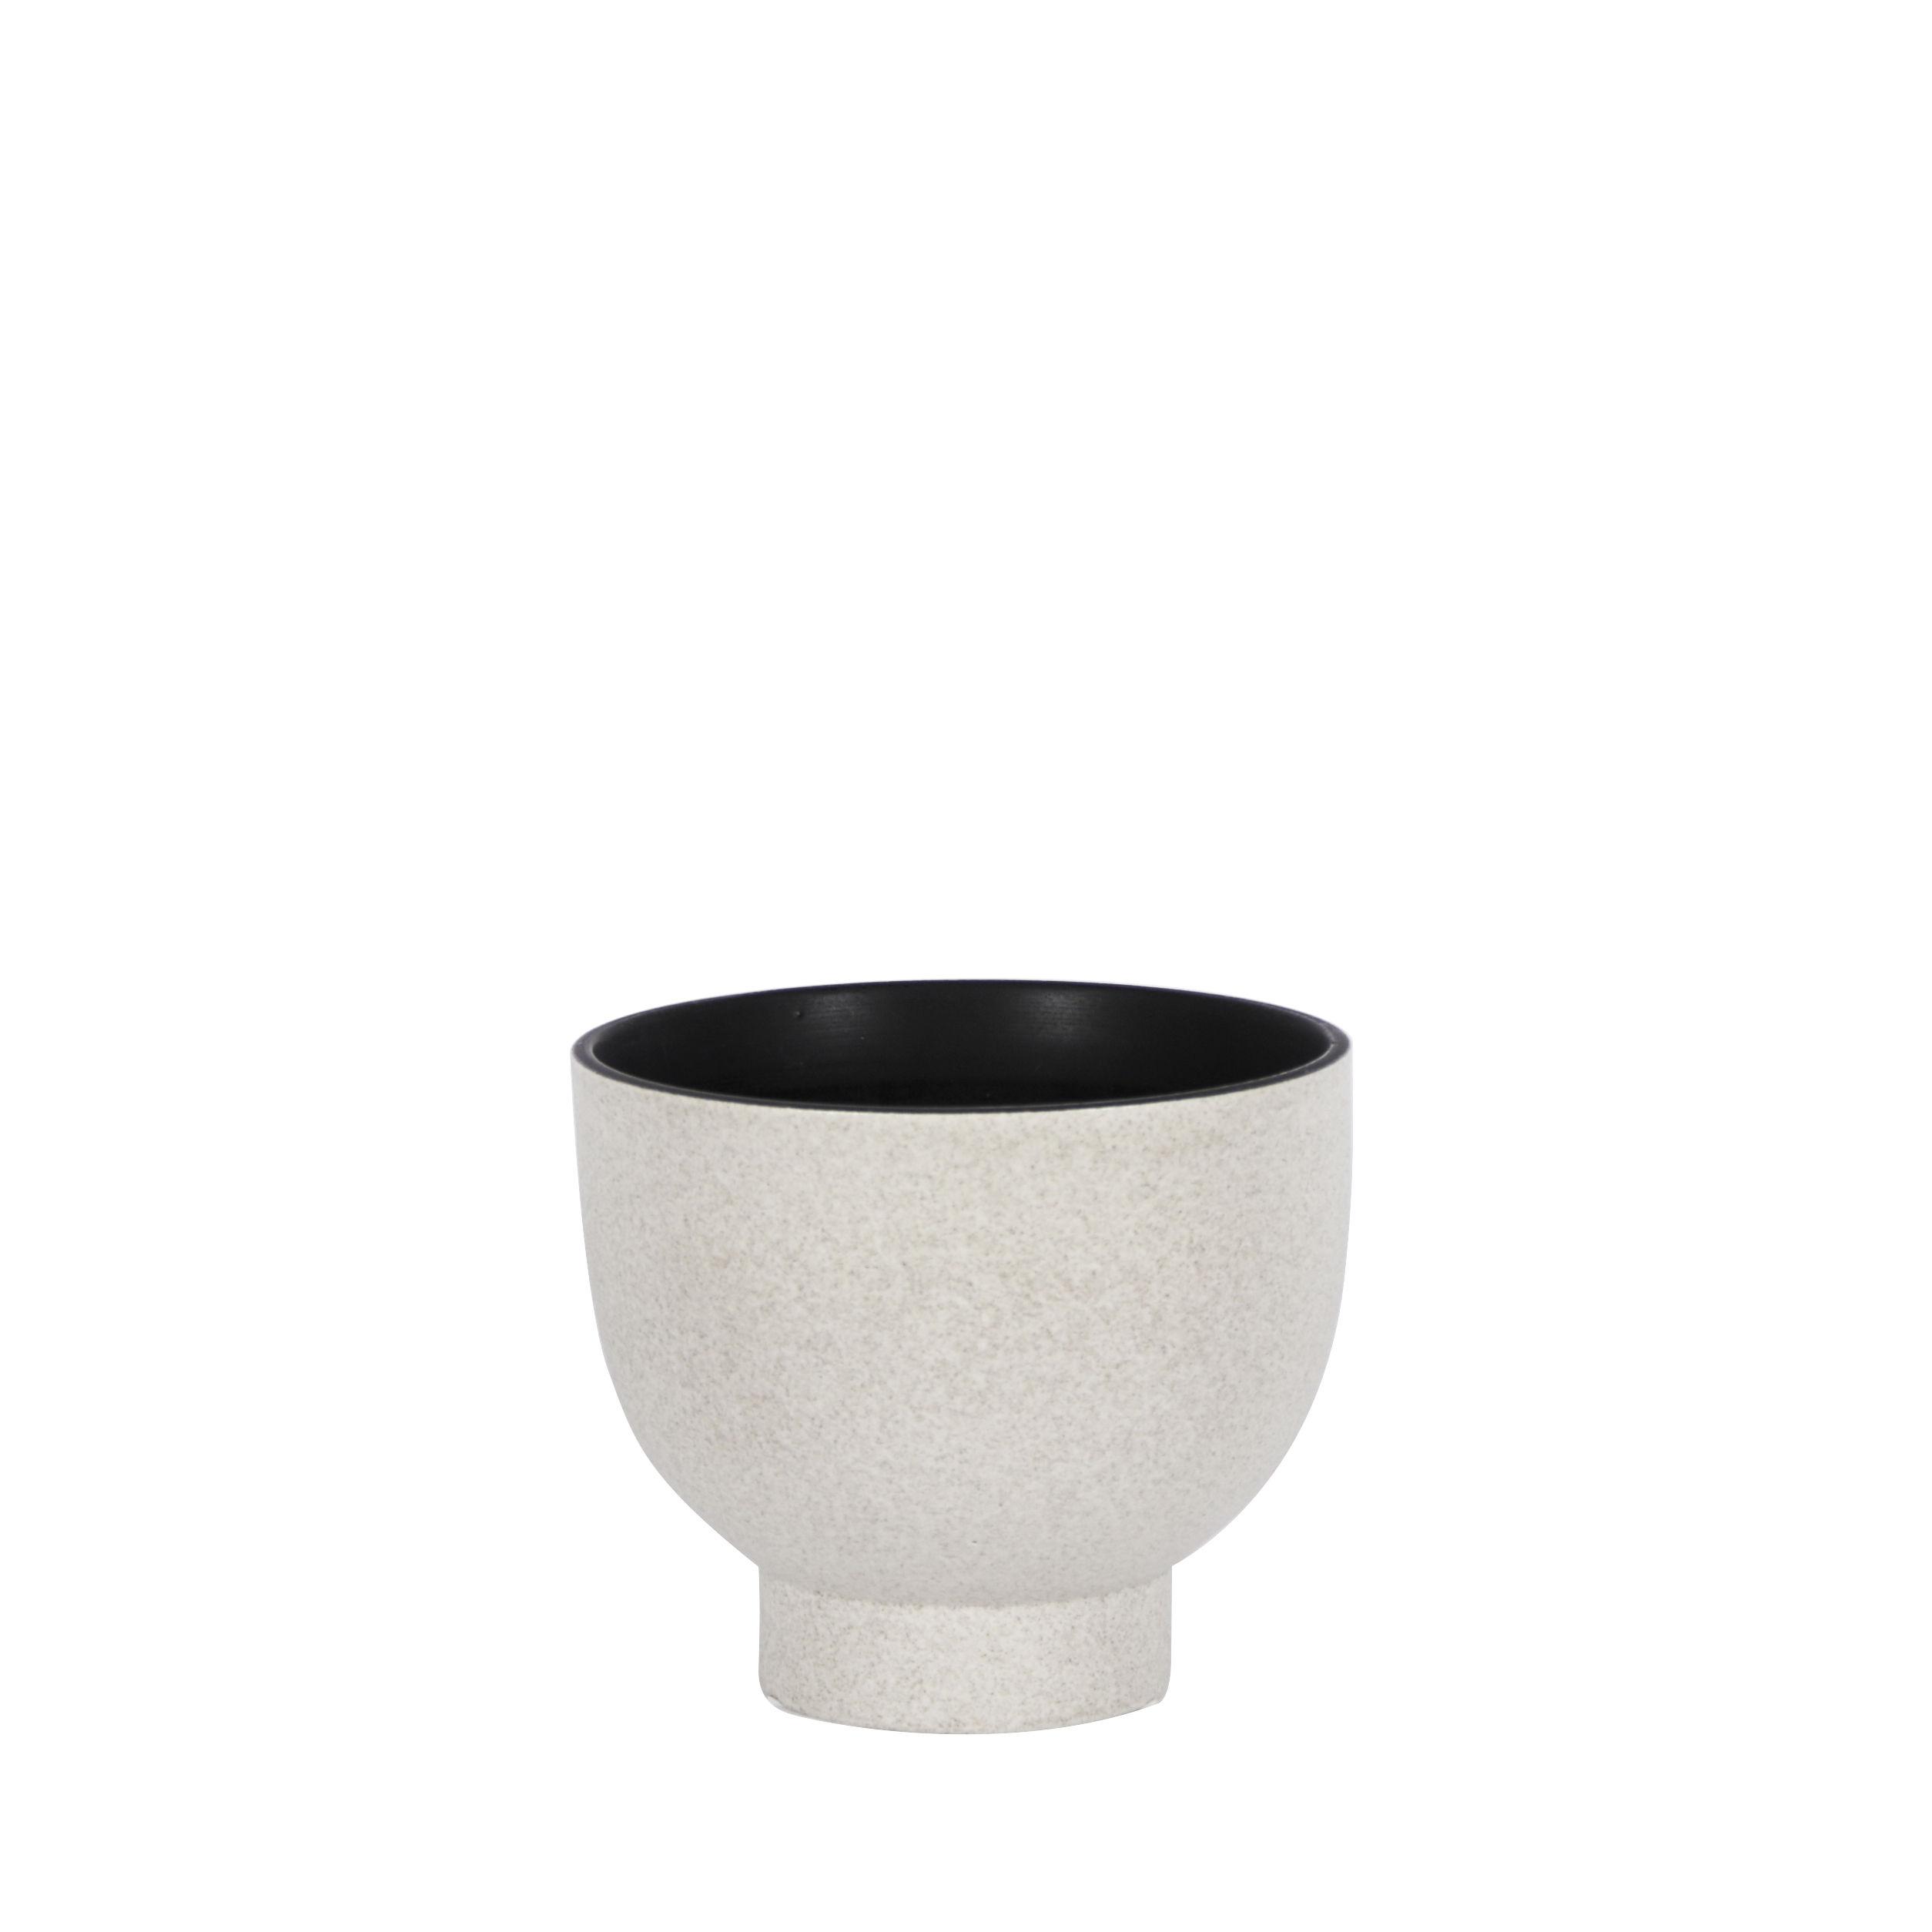 Interni - Vasi - Vaso Tenere Small - / Ø 19 x H 16 cm - Ceramica di ENOstudio - Grège - Ceramica